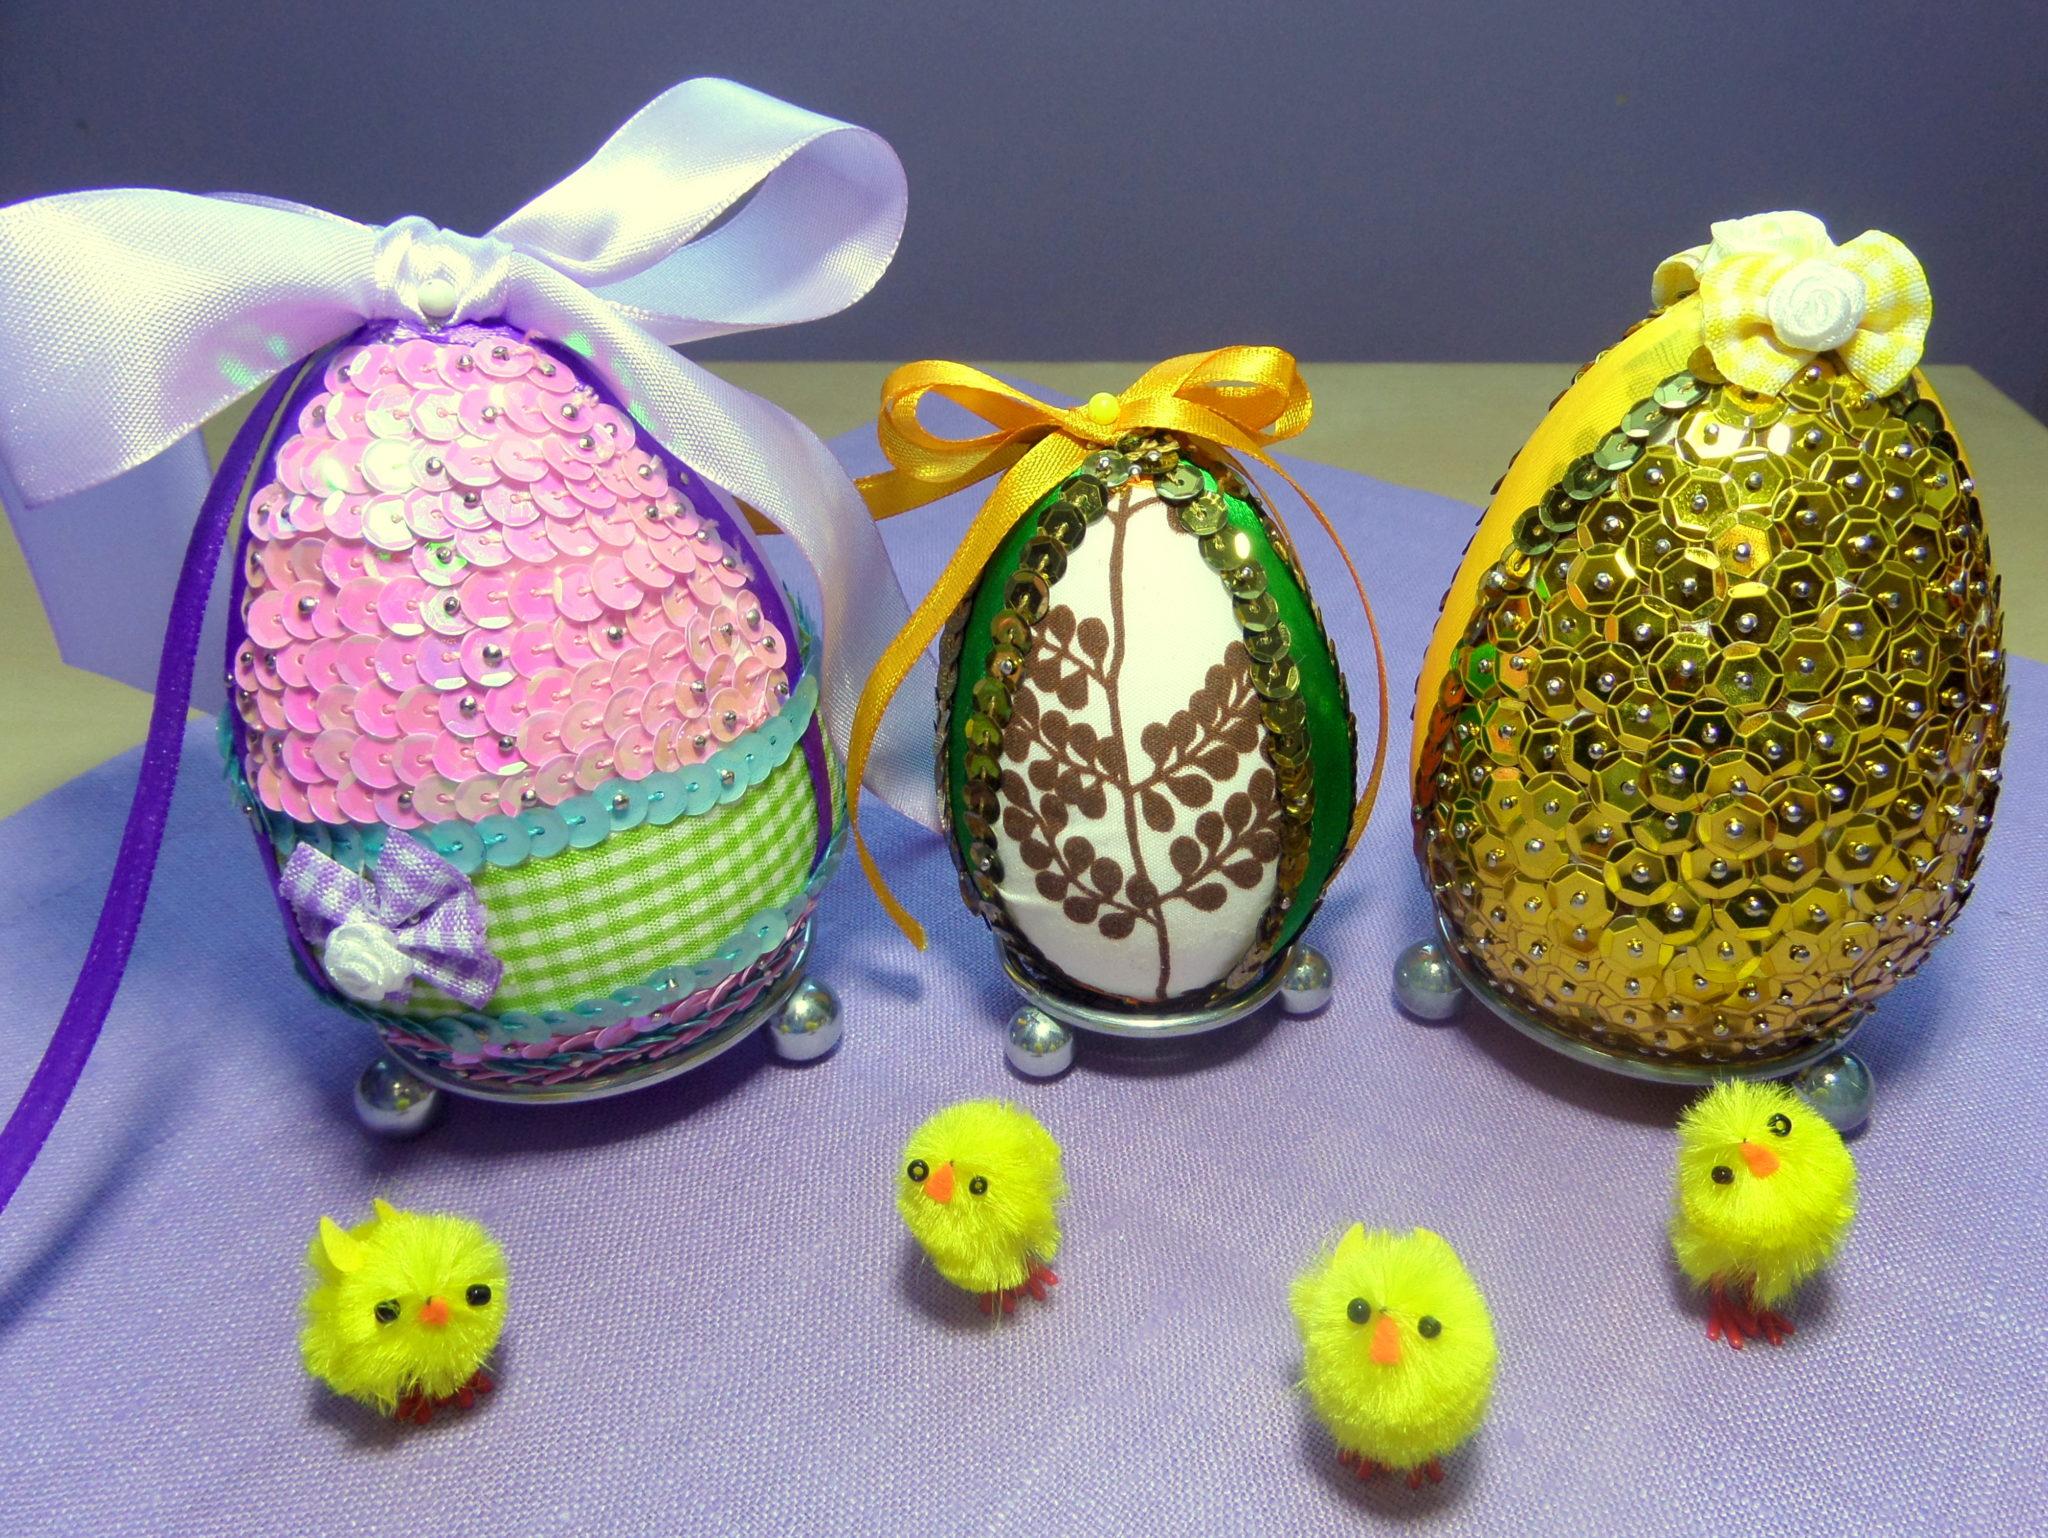 24 - Jajka styropianowe na Wielkanoc